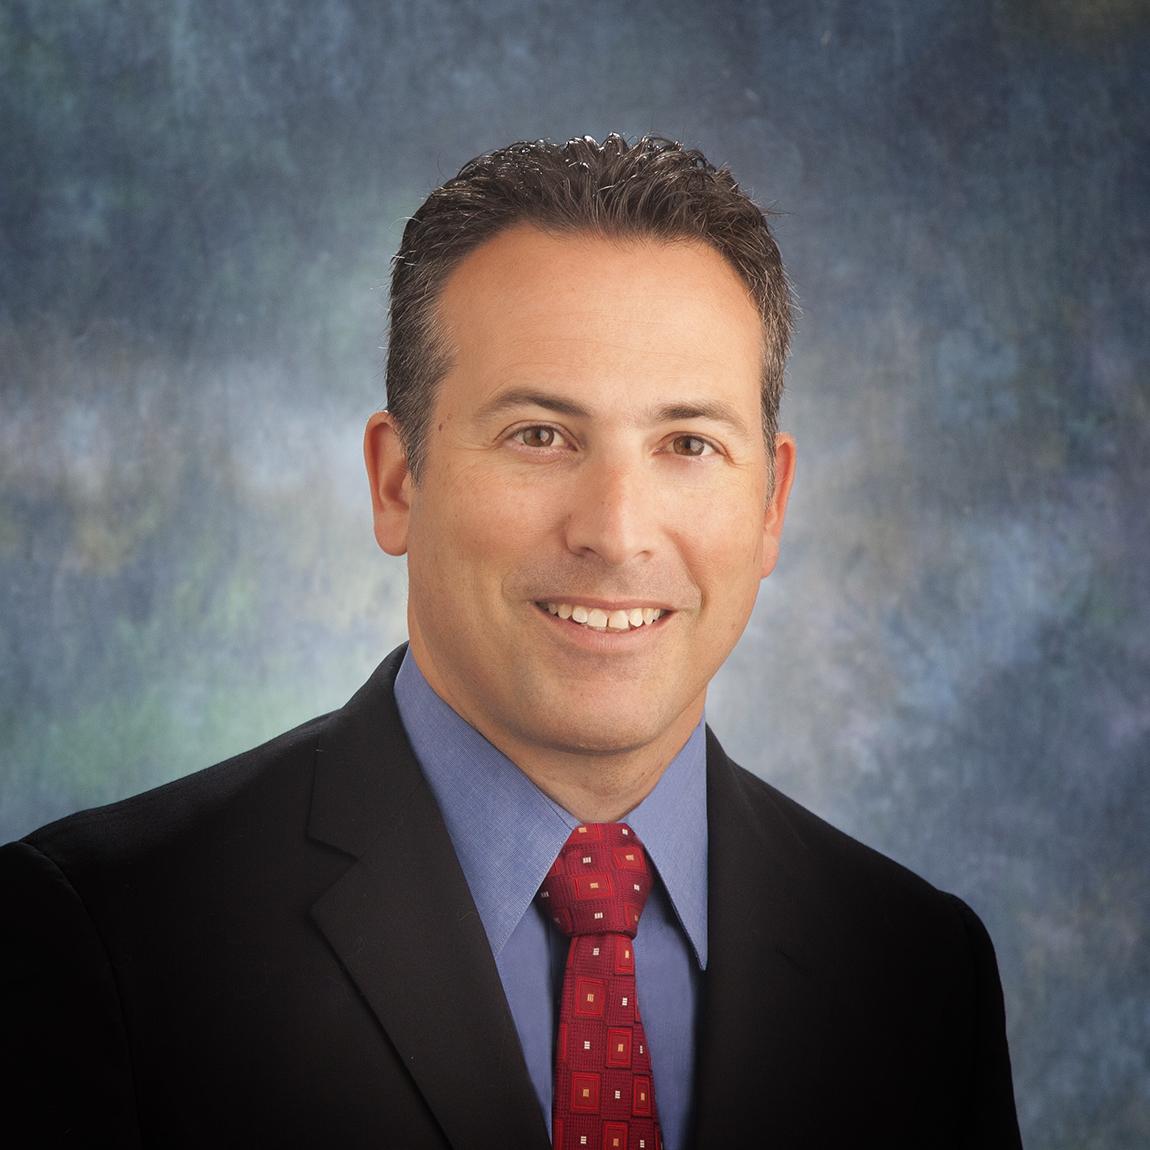 Patrick McMullan, ALCS Capital Investments Entrepreneur